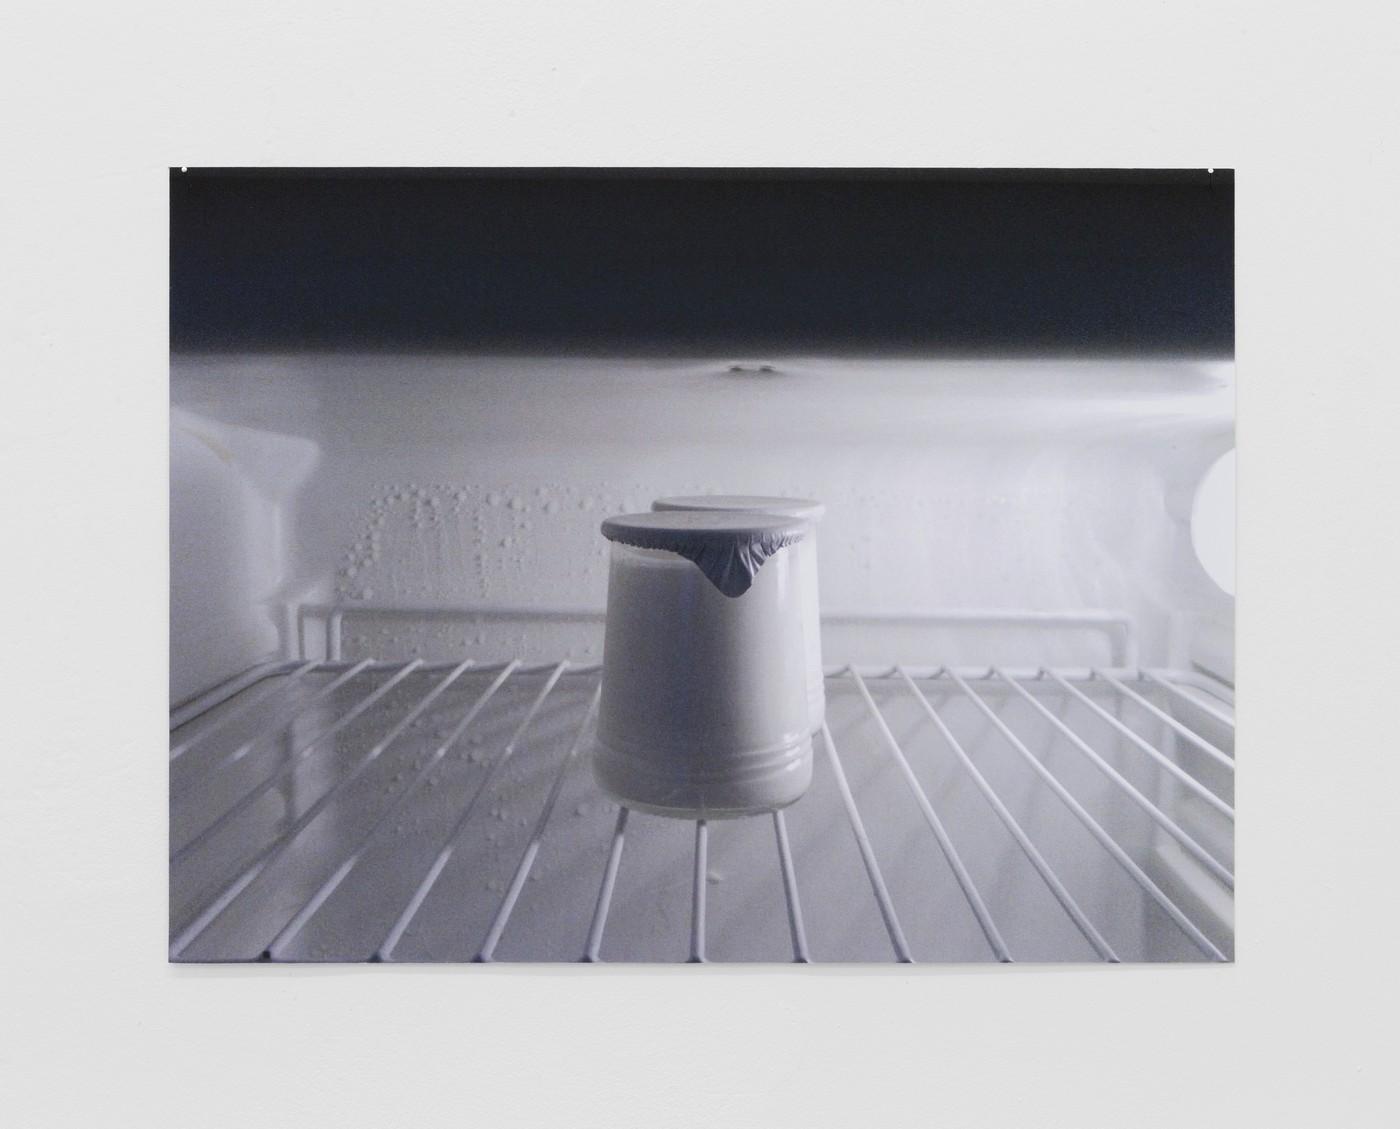 15_gkungrefrigerator2